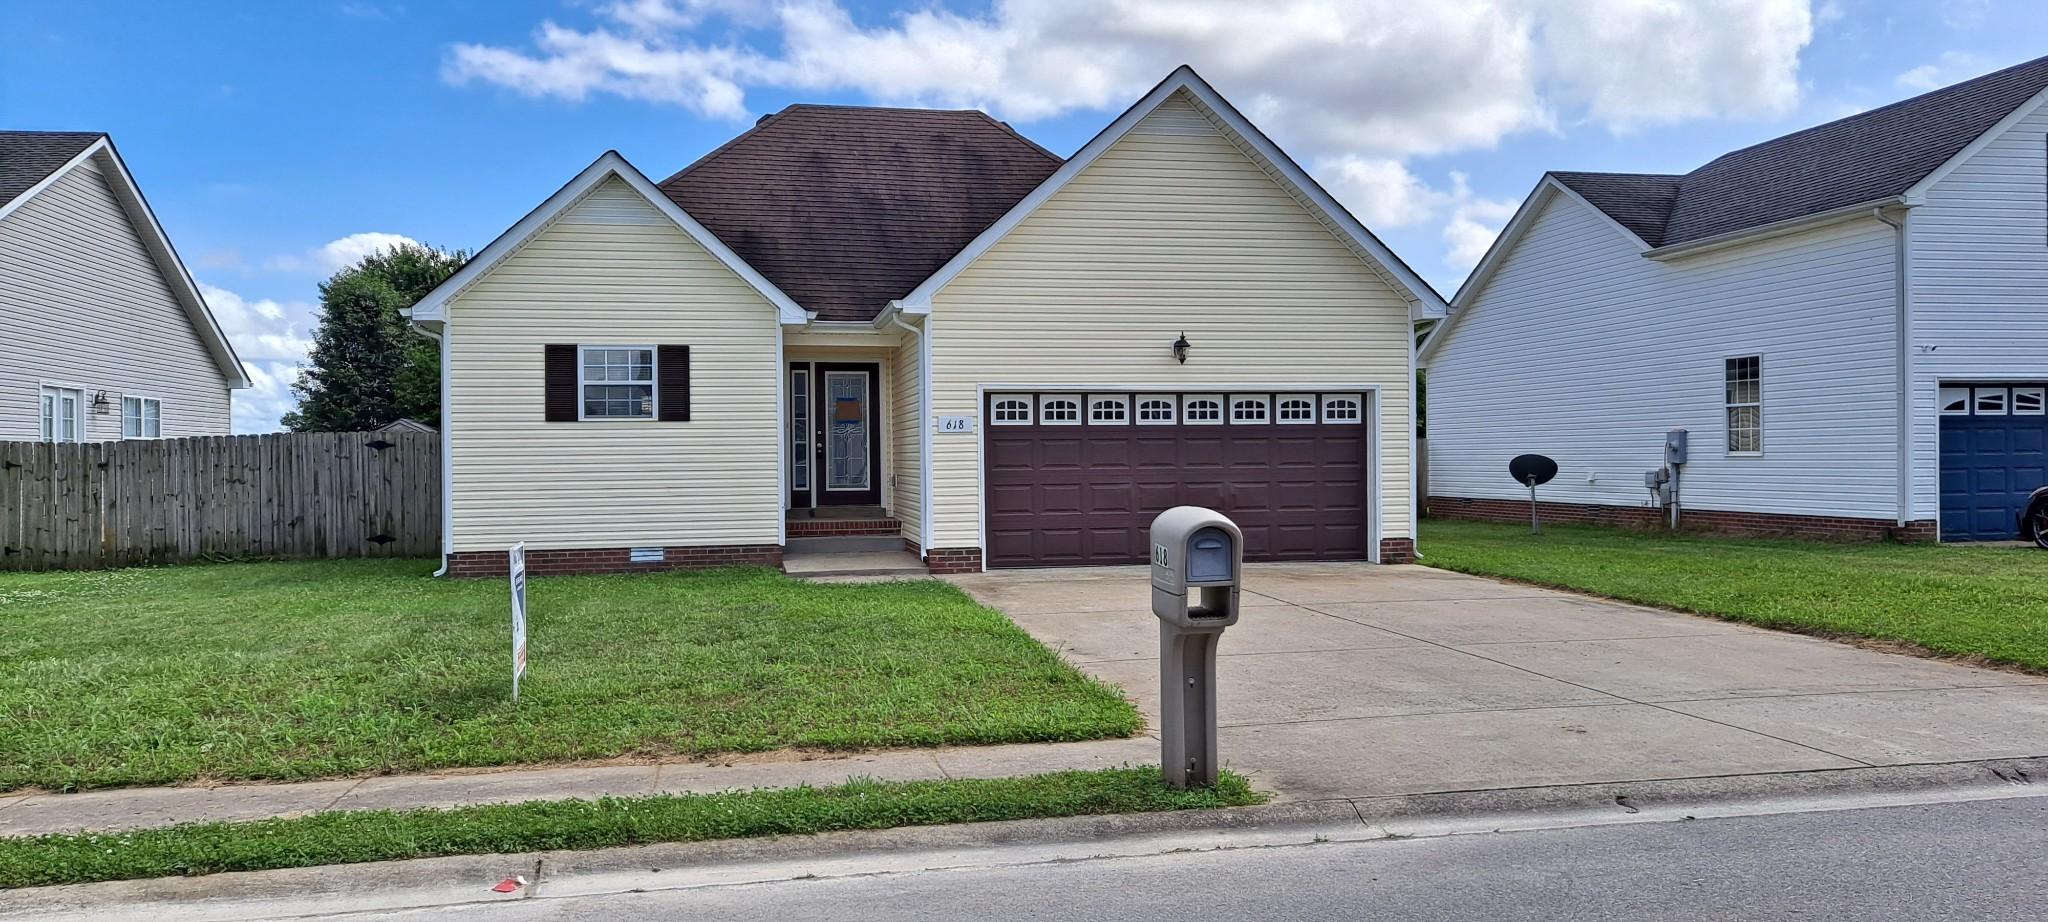 618 S Cavalcade Cir Property Photo